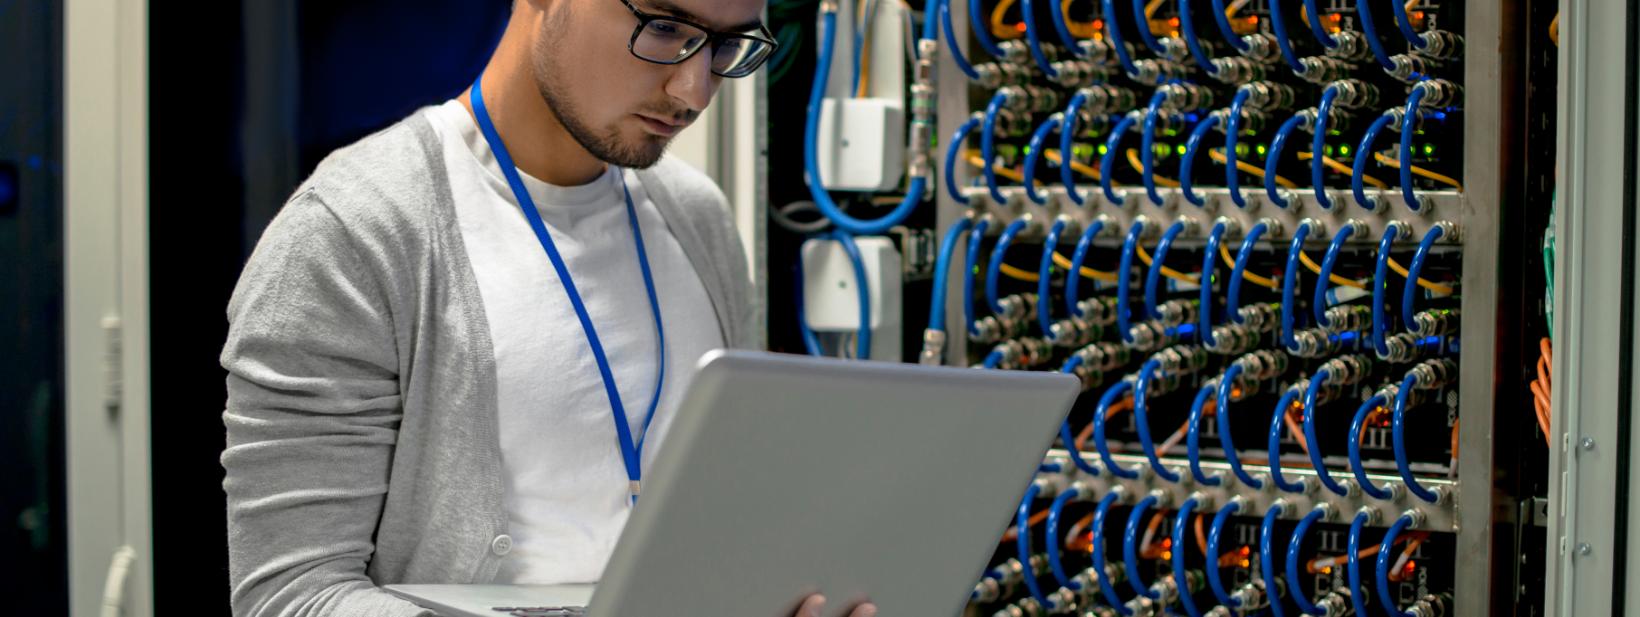 young-engineer-managing-supercomputer-servers-2021-04-02-23-20-34-utc.png